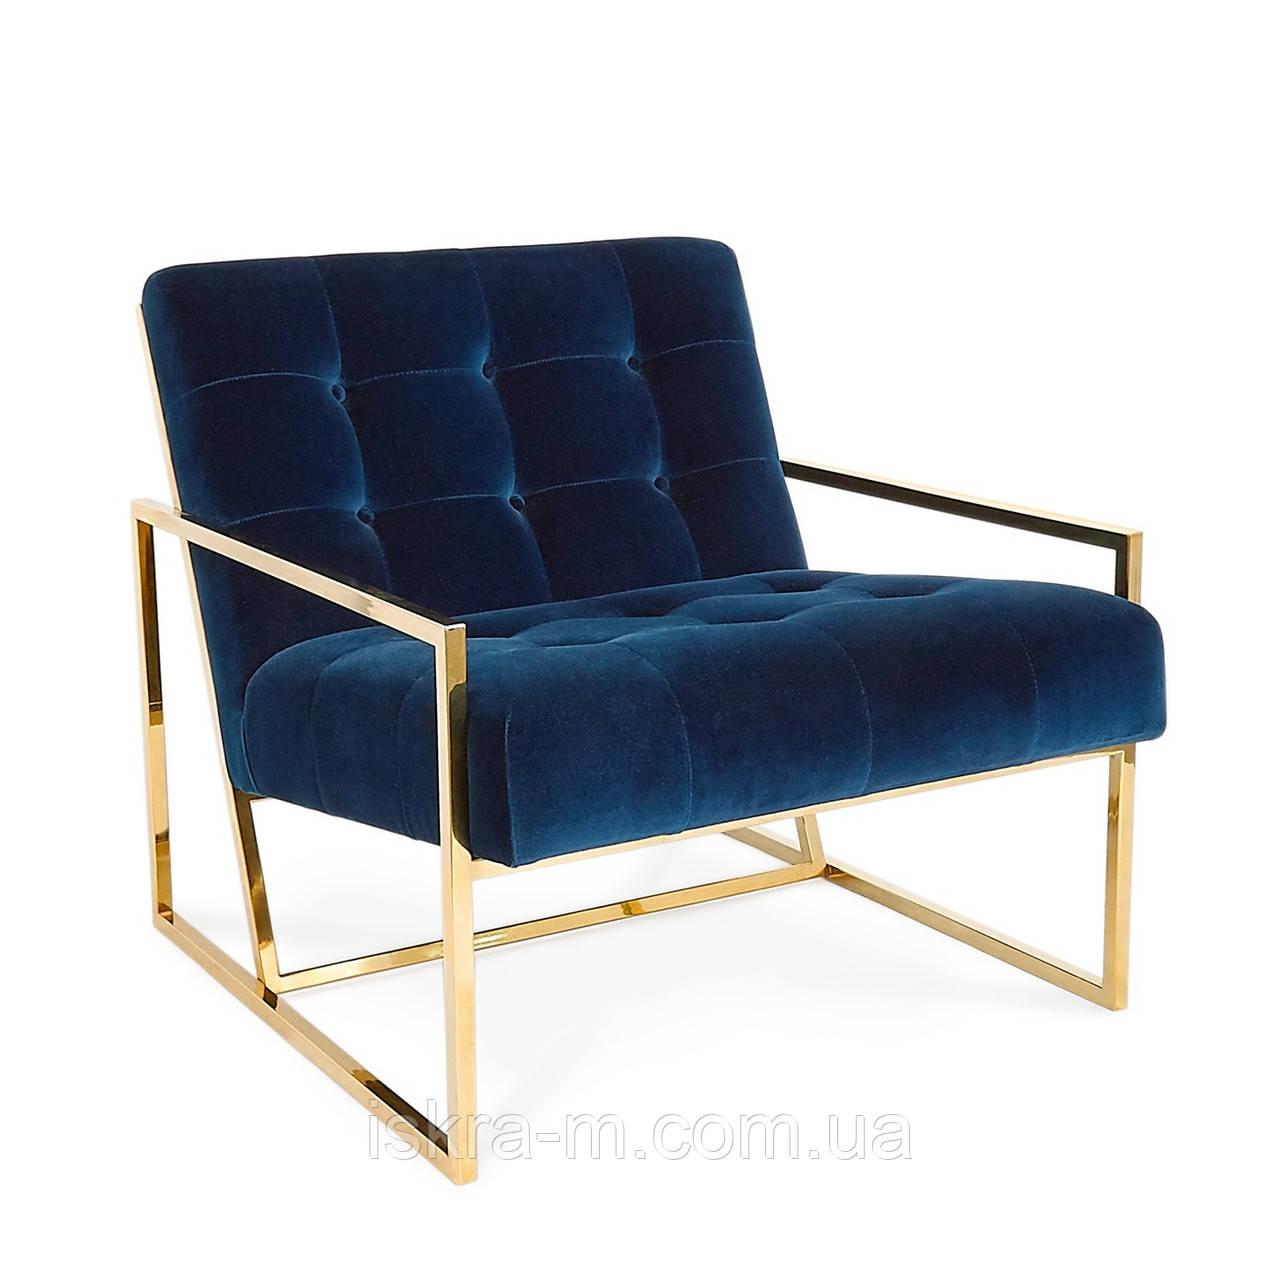 Кресло синее мягкое лофт